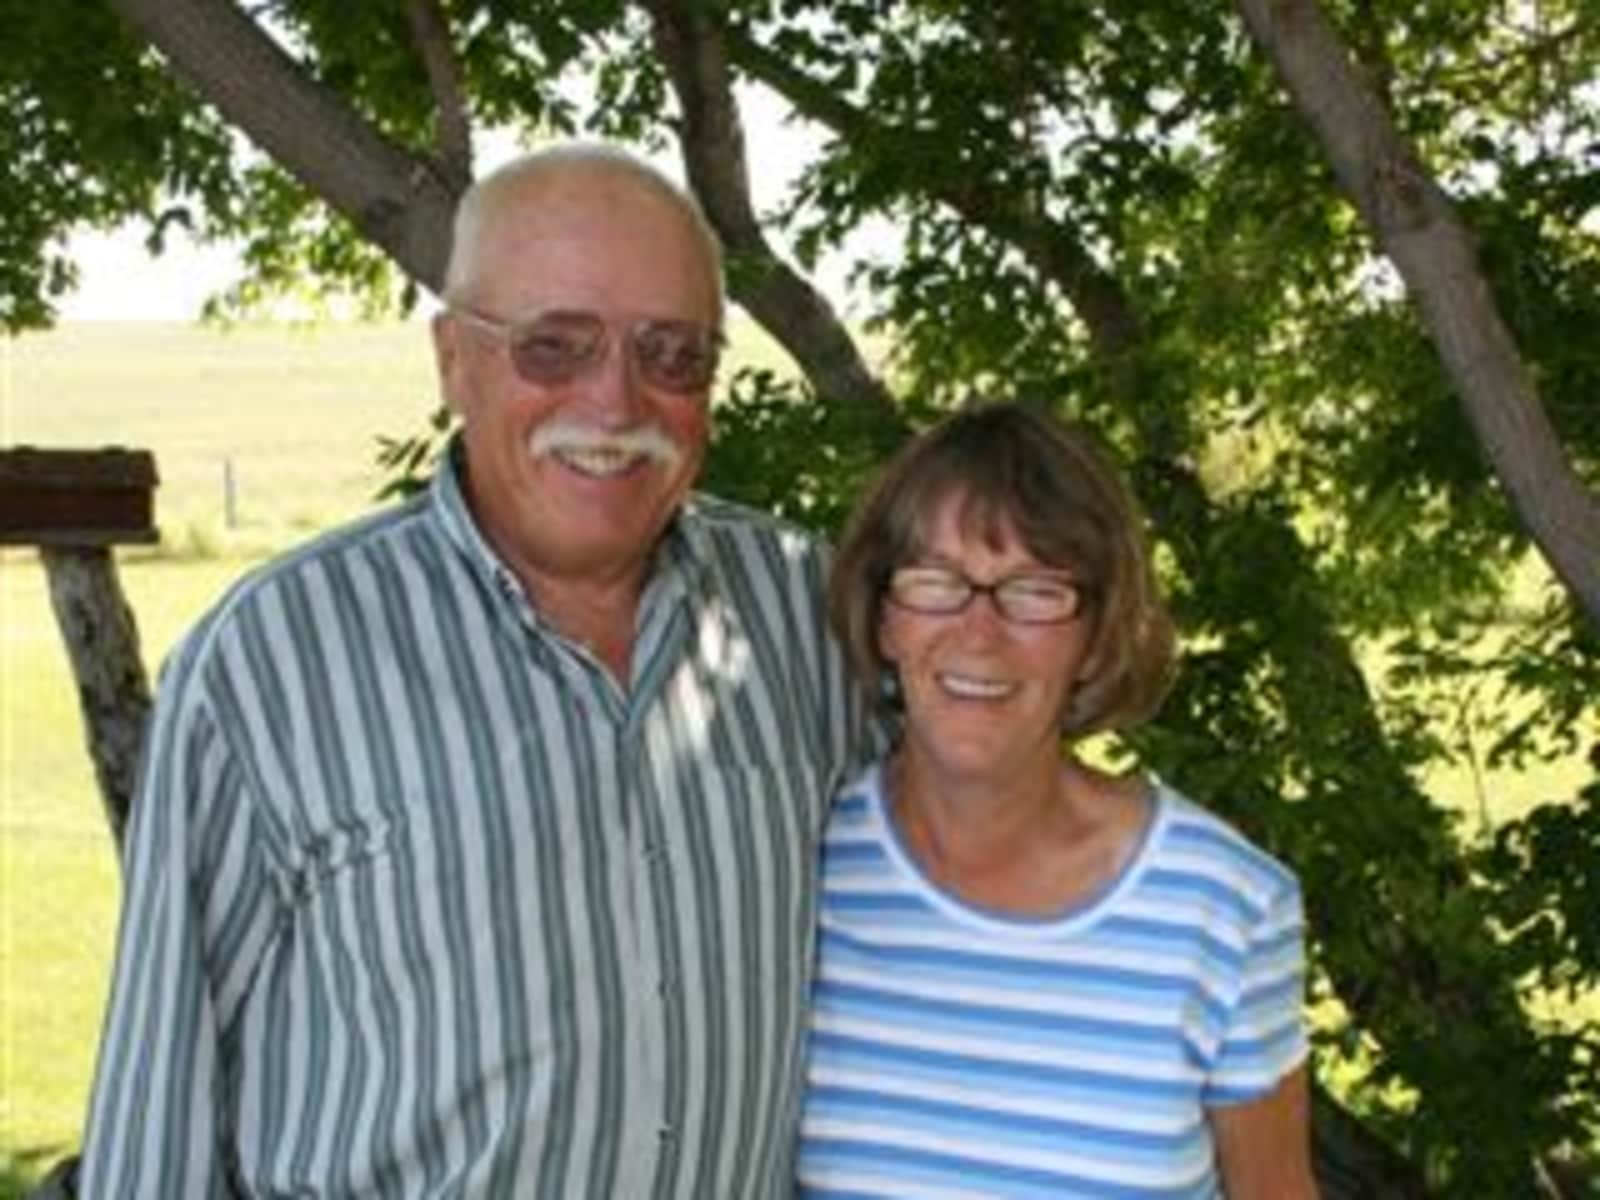 Harry & Margo from Pincher Creek, Alberta, Canada